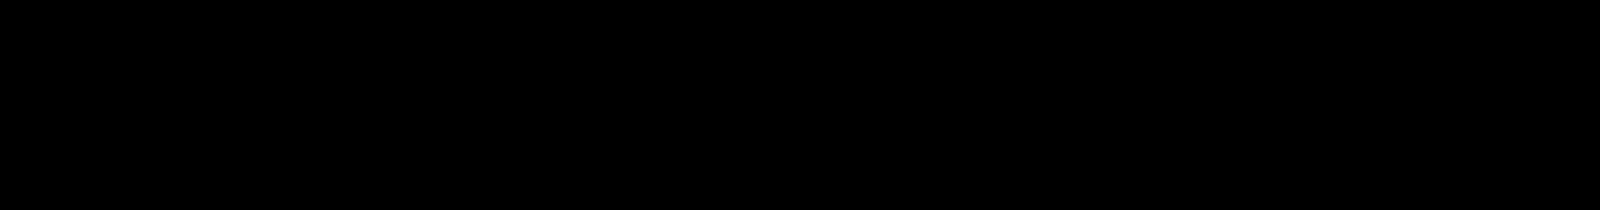 1544075635275